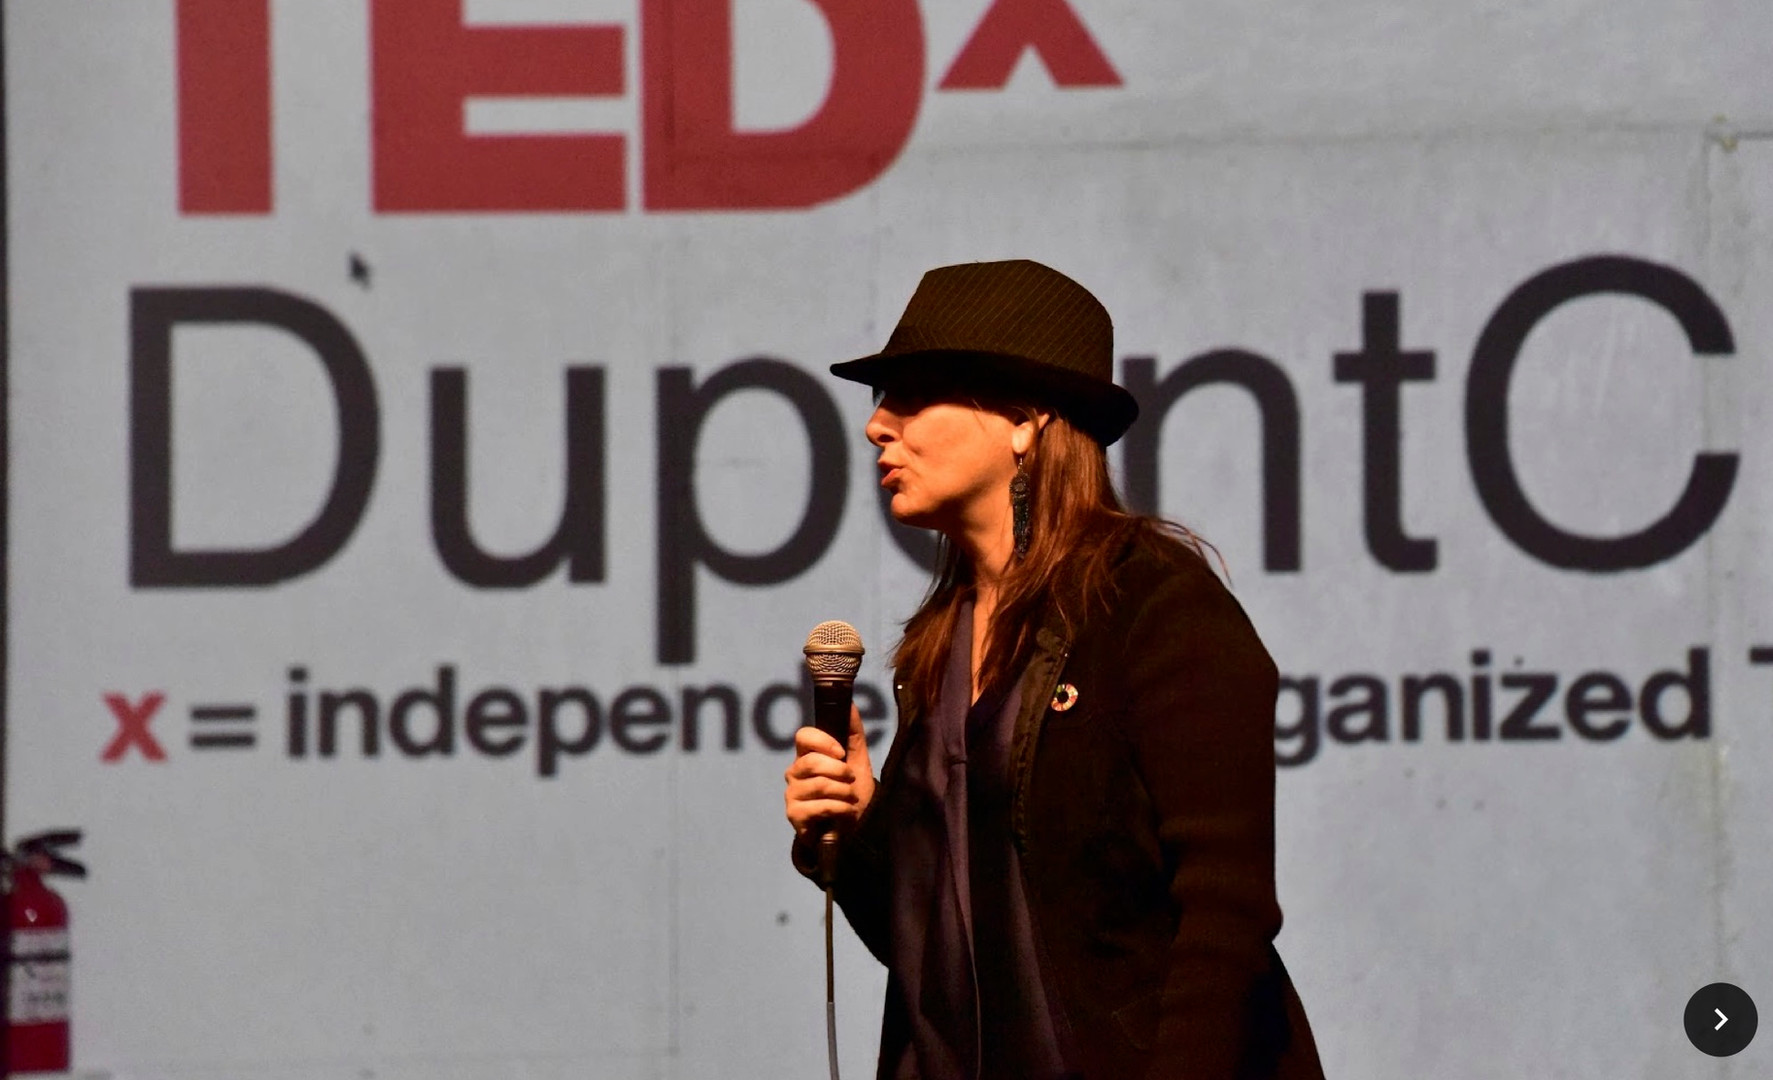 TEDx DupontCircleED